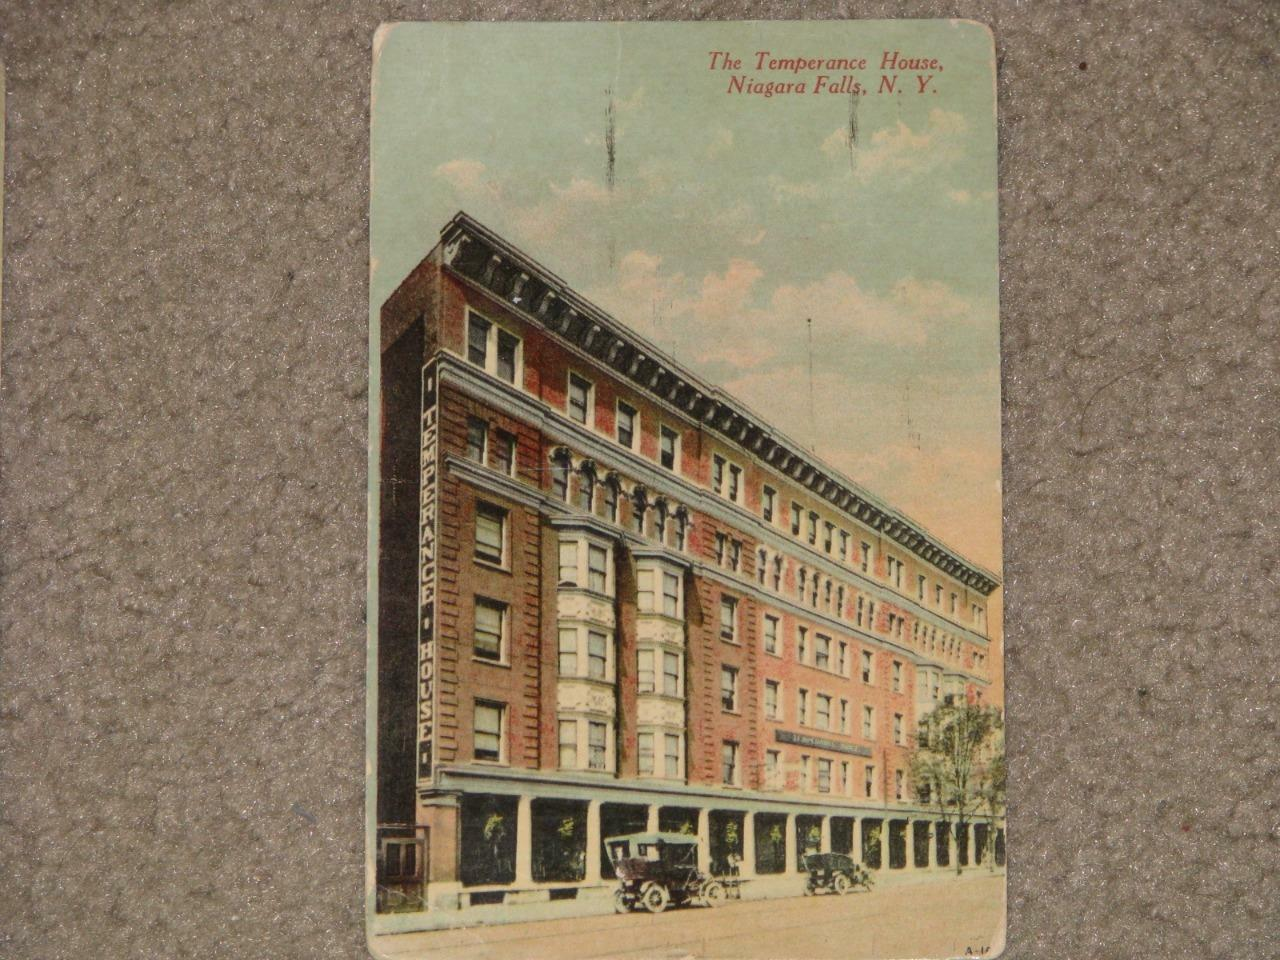 The Temperance House, Niagra Falls, N.Y. 1913, used vintage card